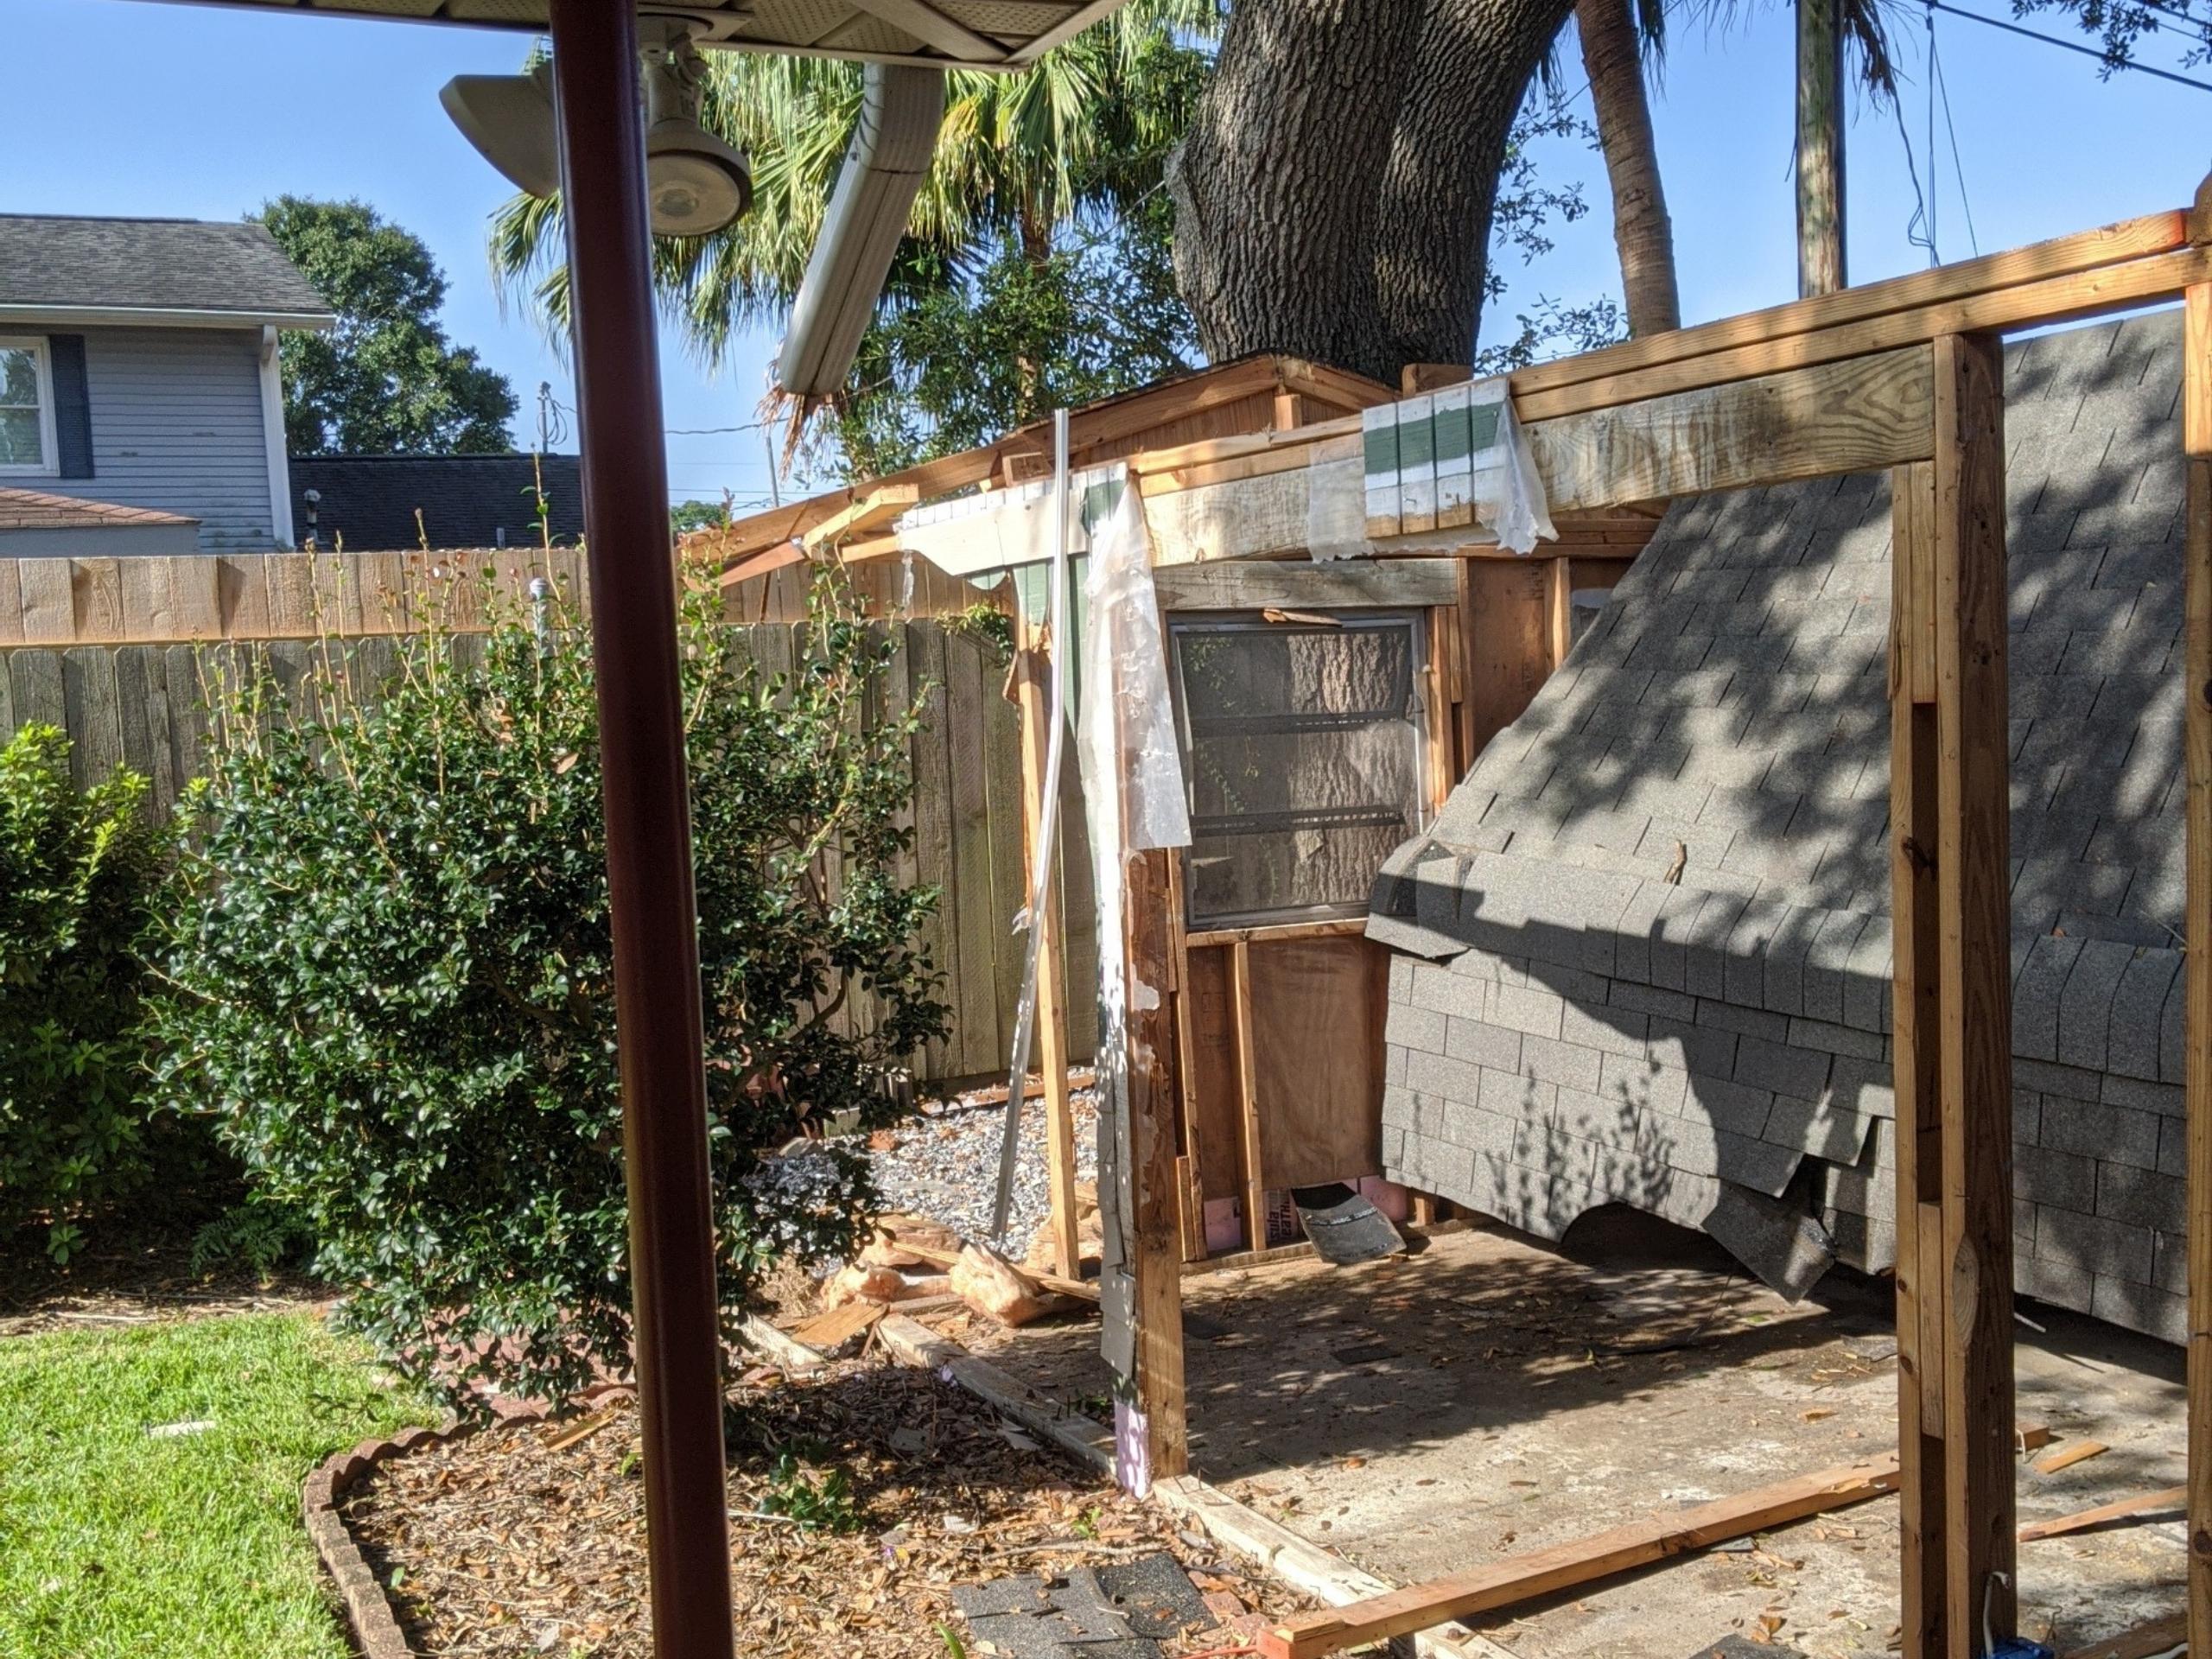 demolition in New Orleans